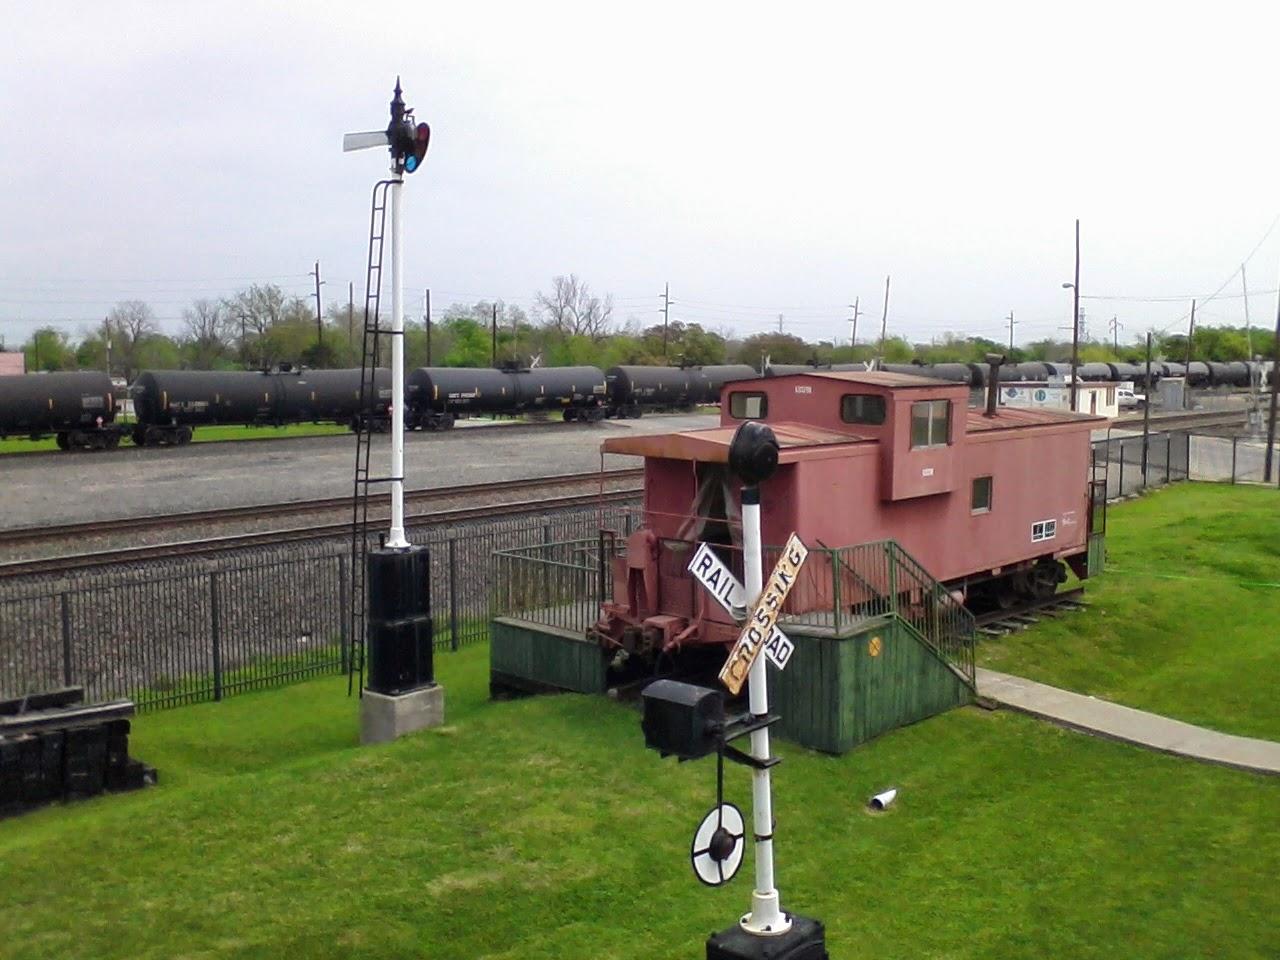 Rosenberg Railroad Museum - 0405115905.jpg